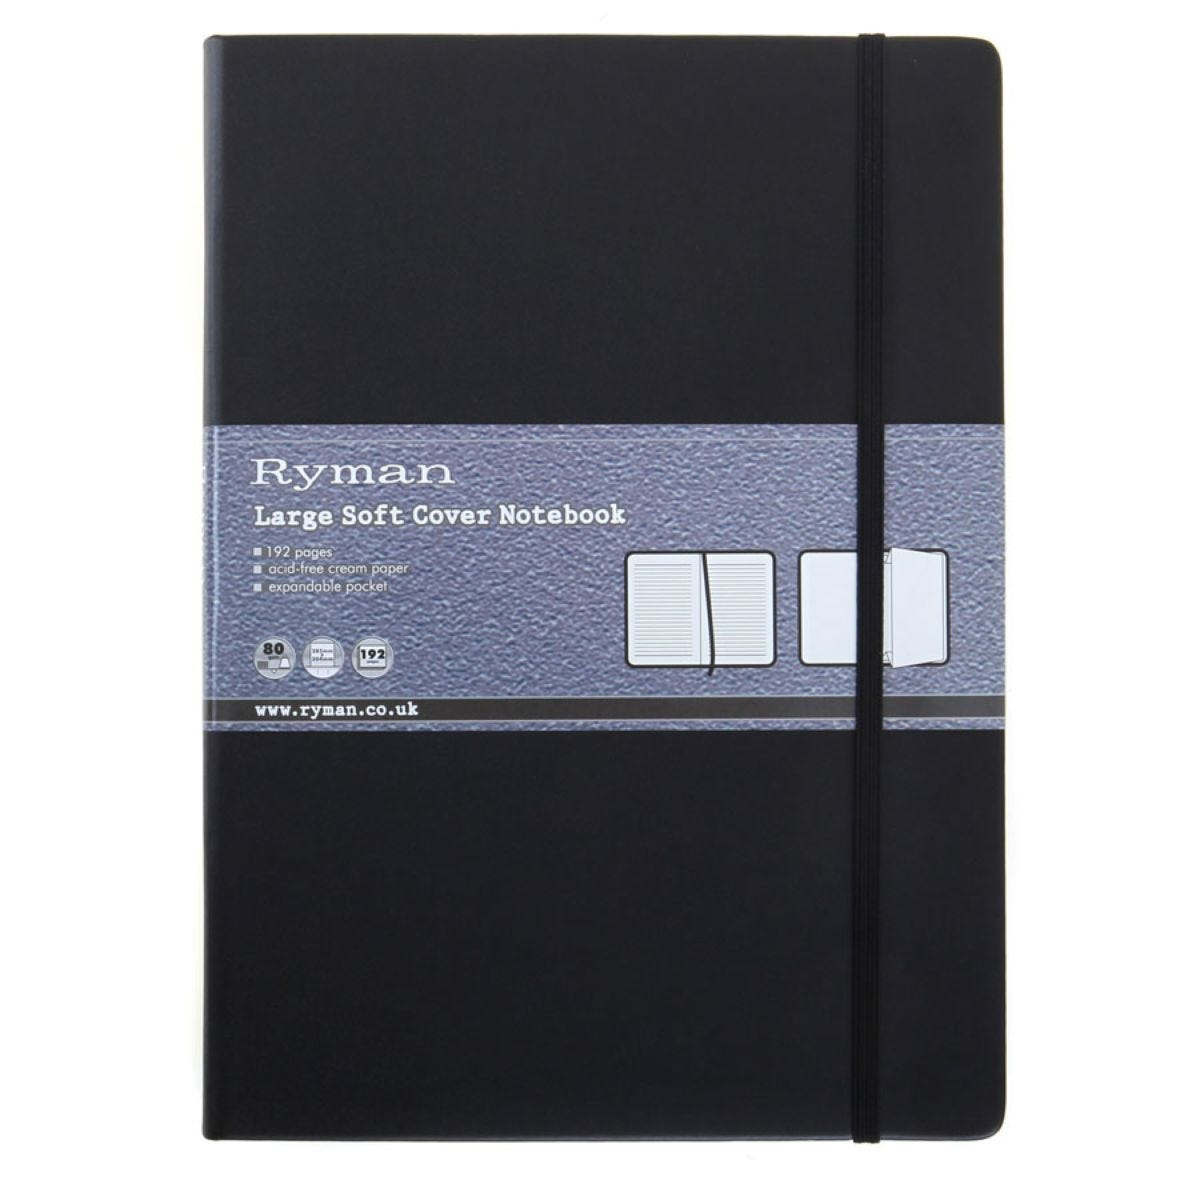 Ryman Large Soft Cover Notebook - Black